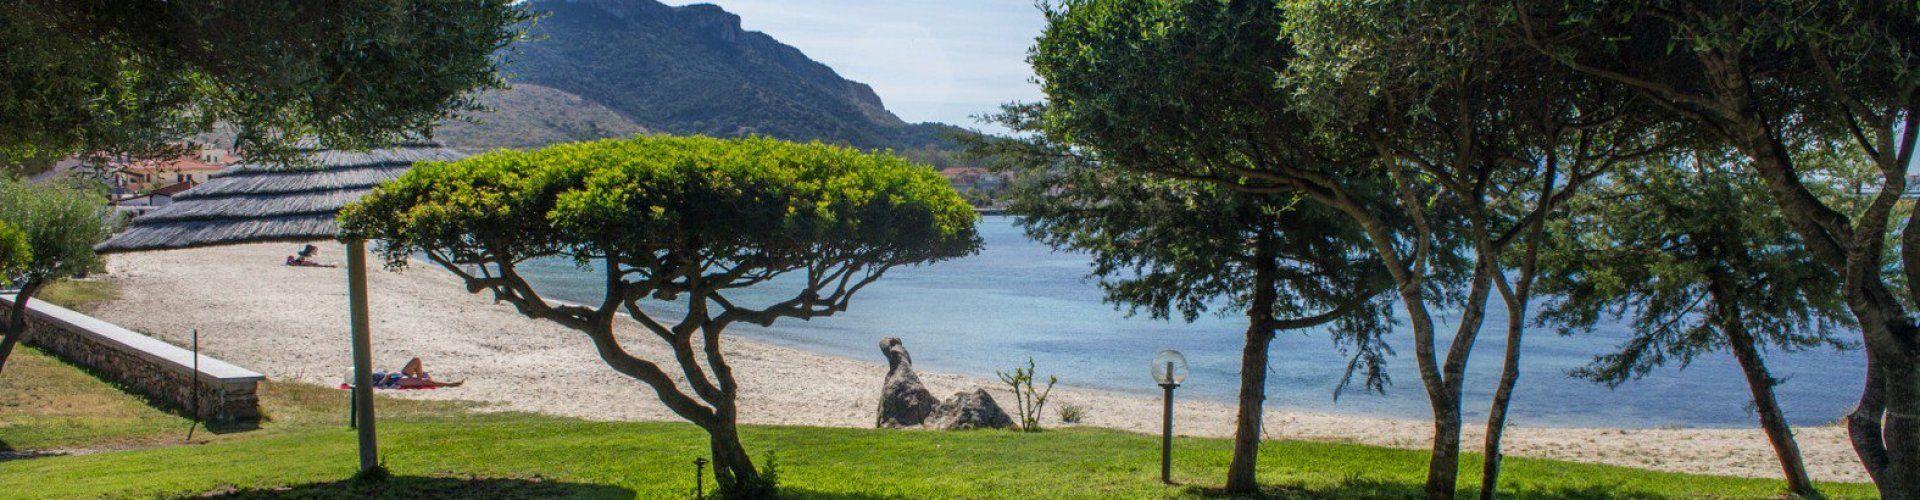 Golfo Aranci vor dem Haus